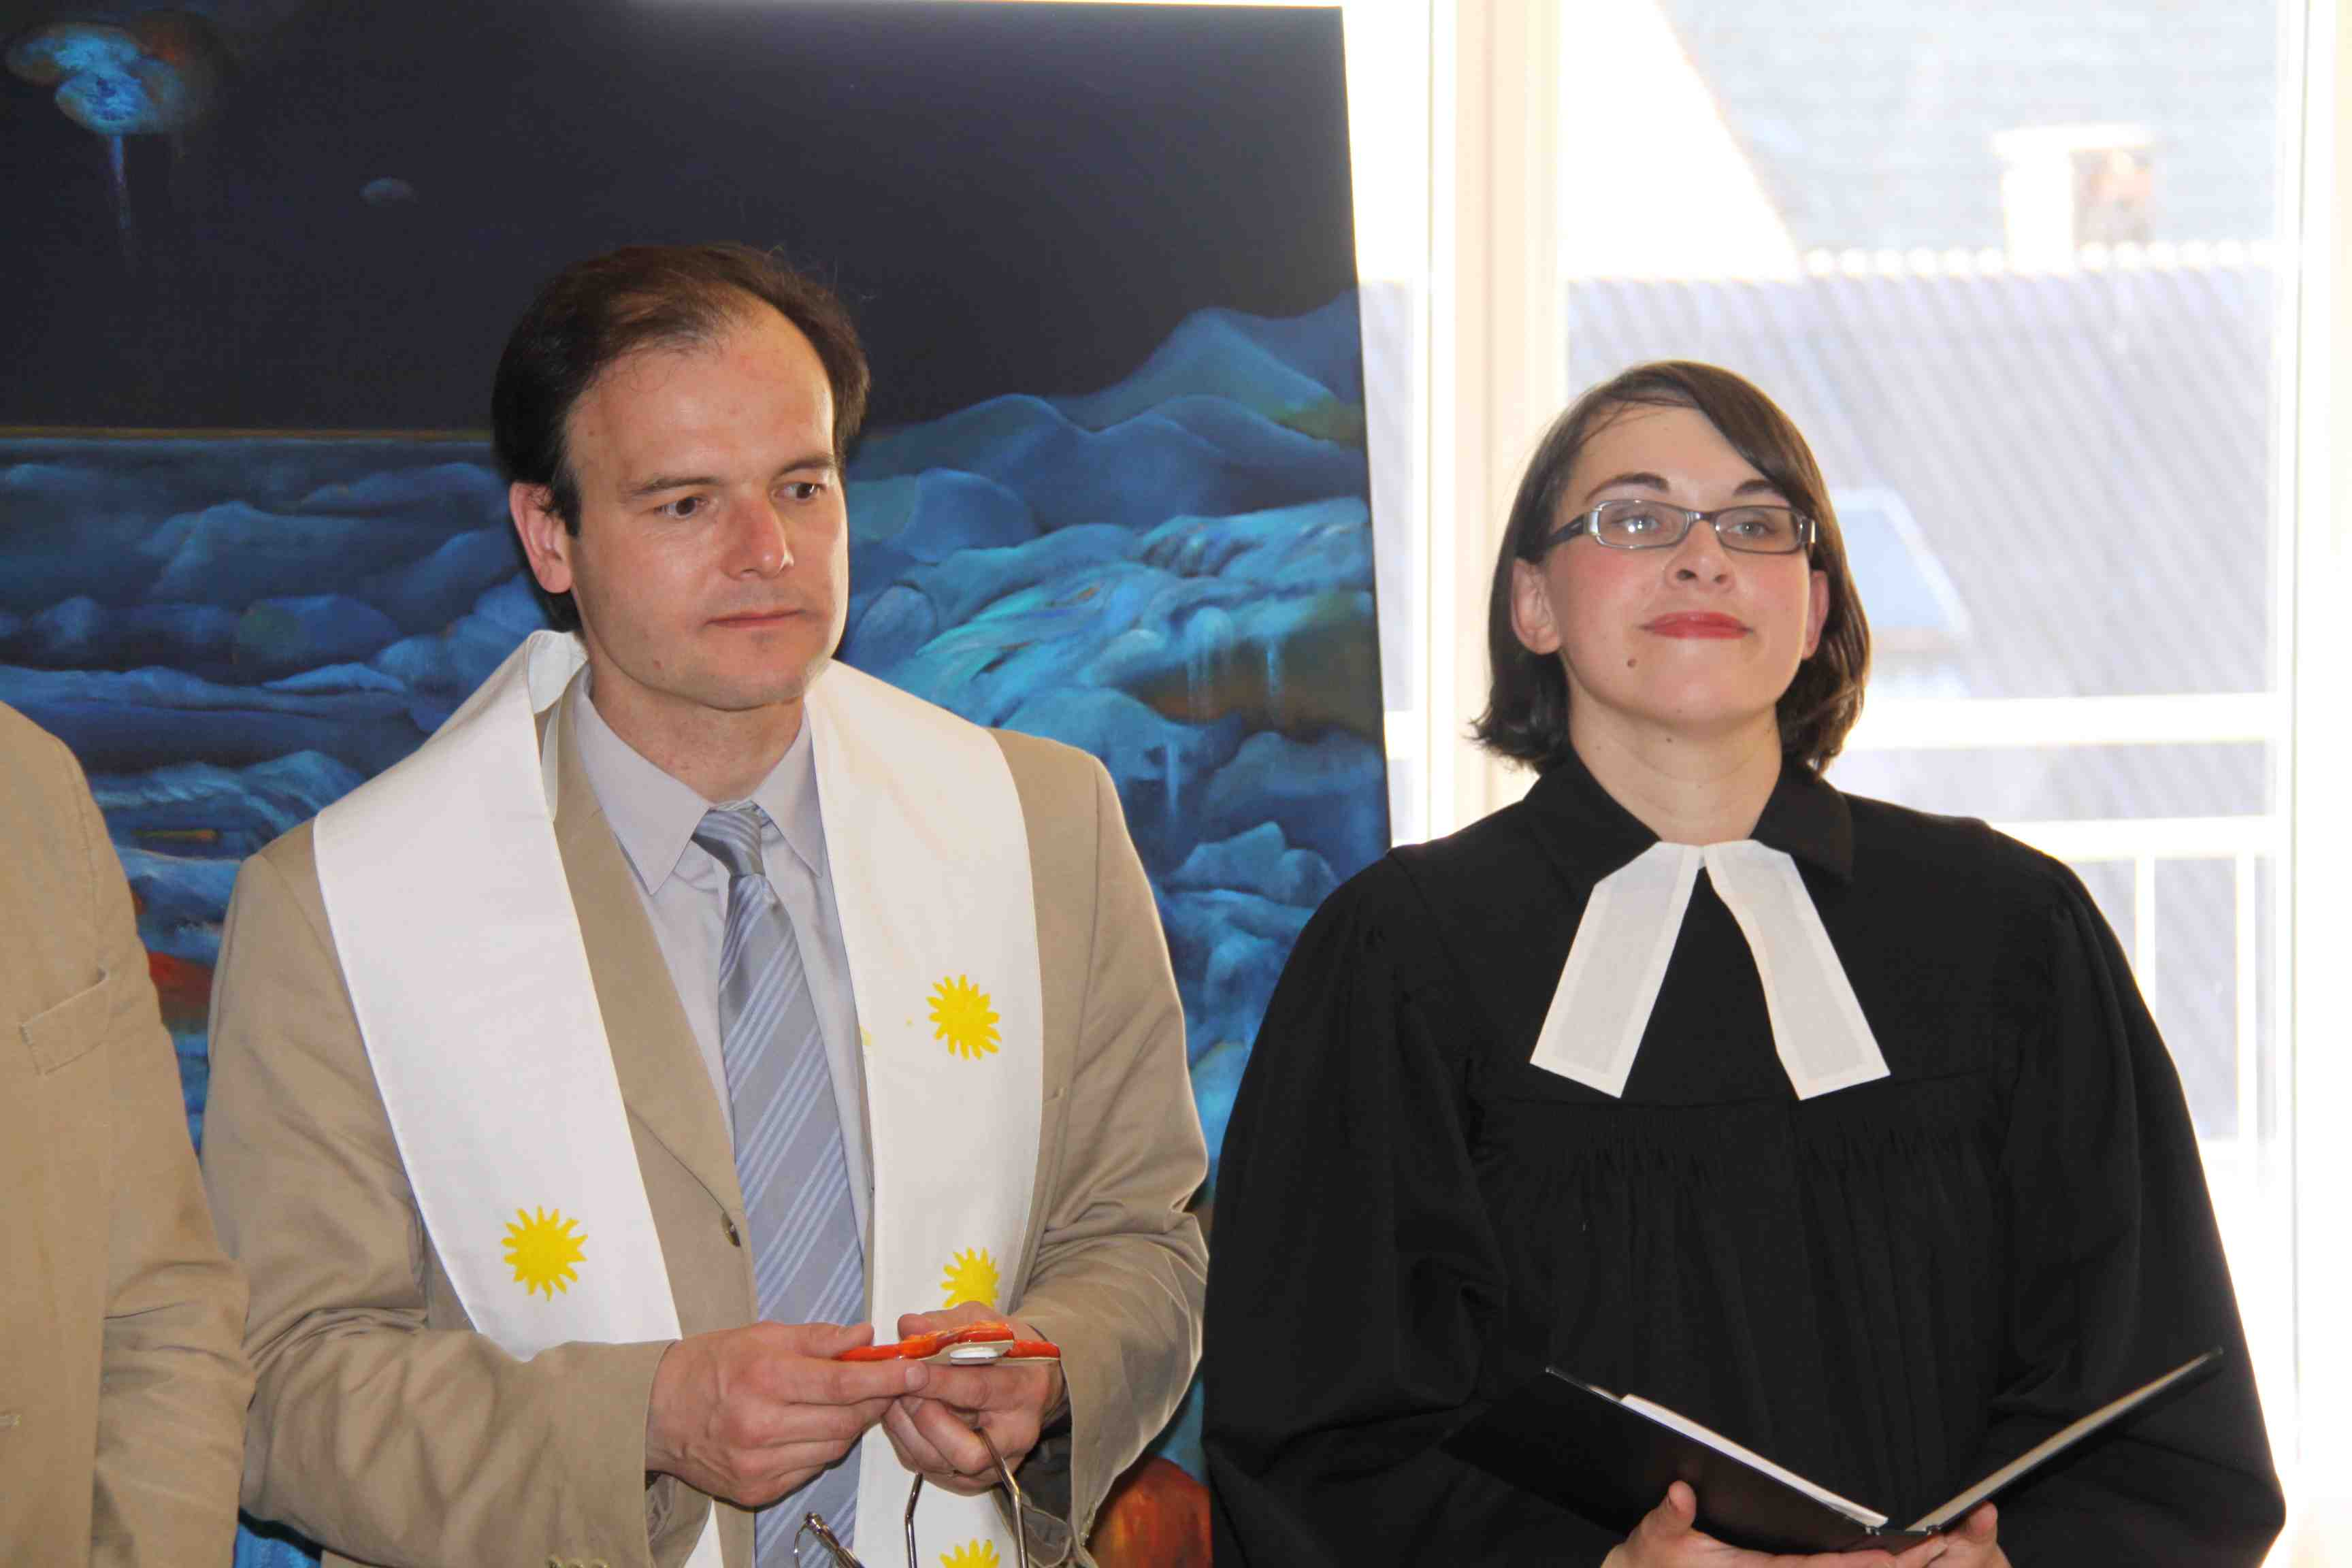 Pater Mag. Gabriel Kozuch, Pfarrerin Mag. Iris Haidvogel